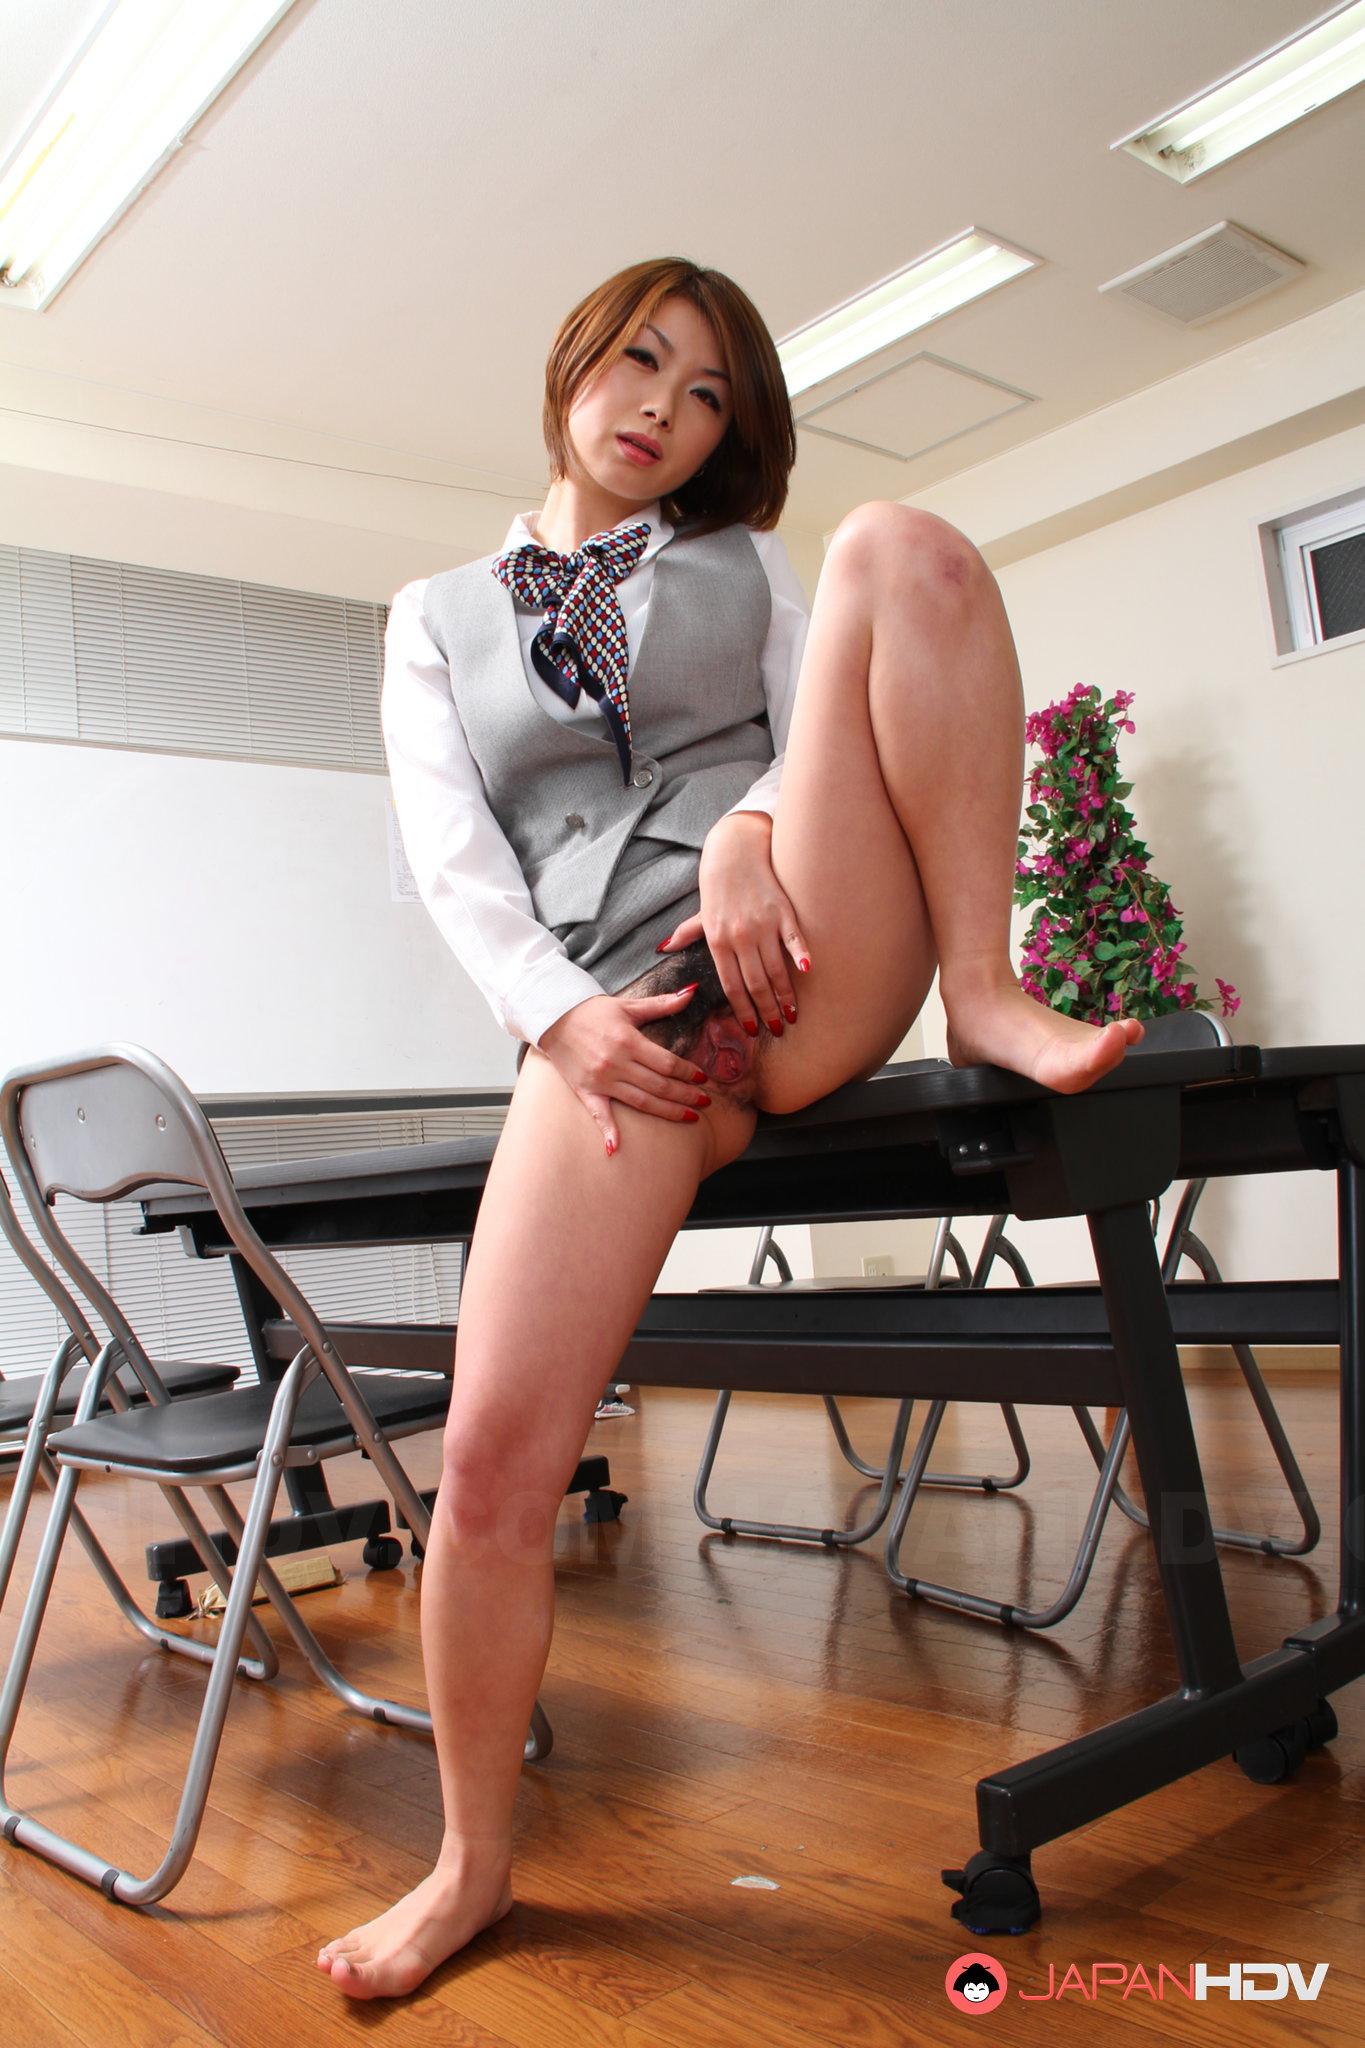 Sexy Japanese office lady Tsubaki posing | Japan HDV